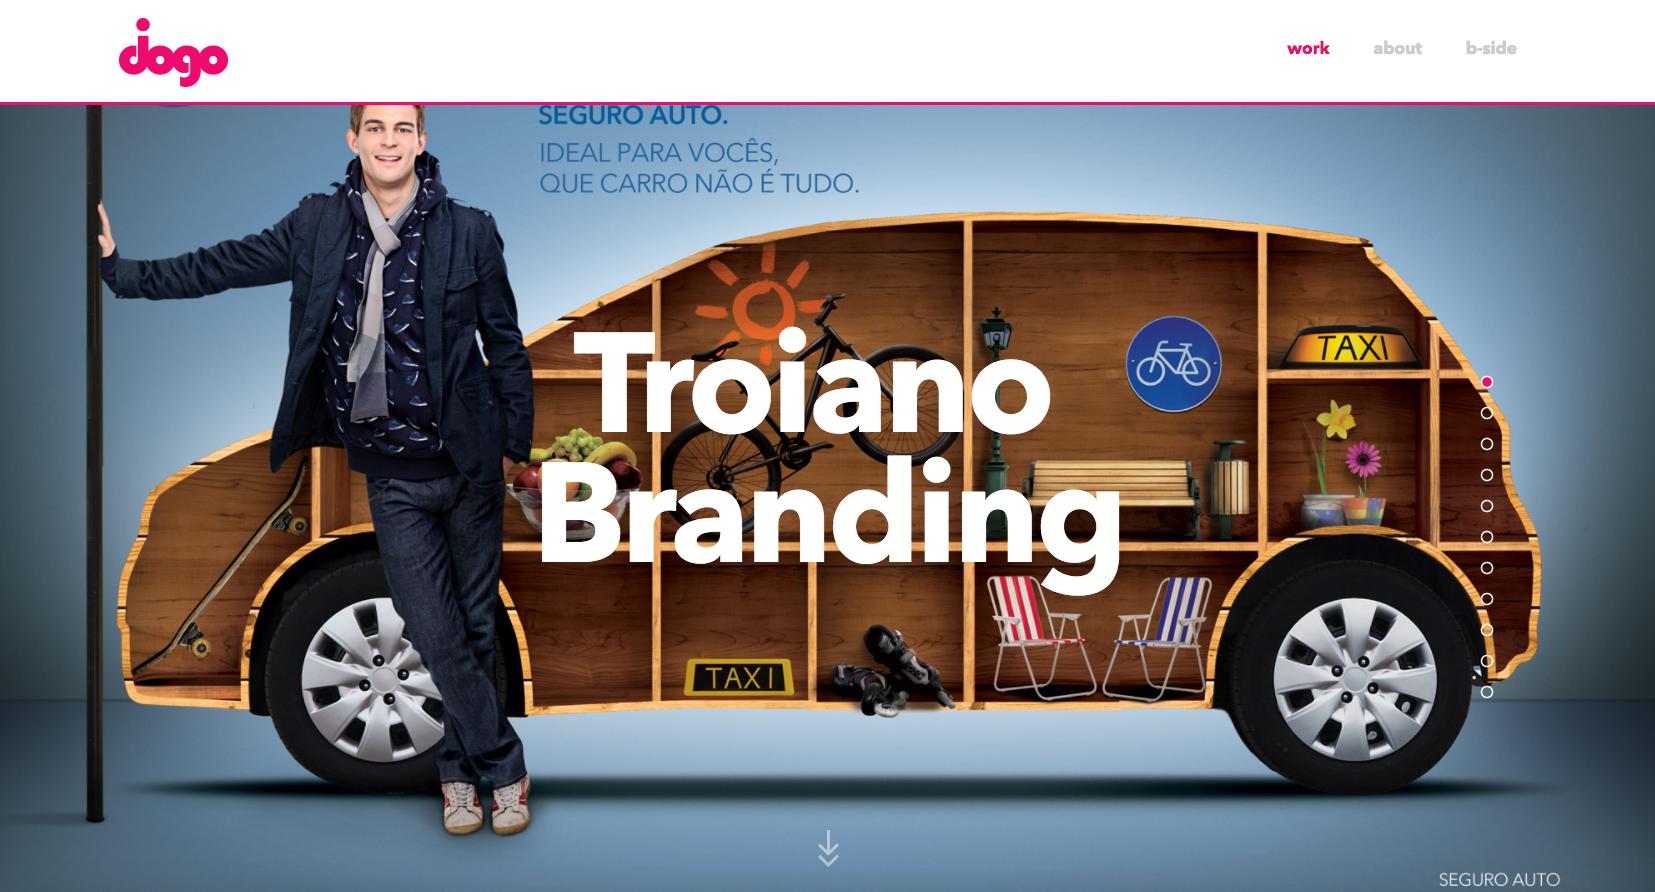 Diogo - Brazil - Agency - Digital